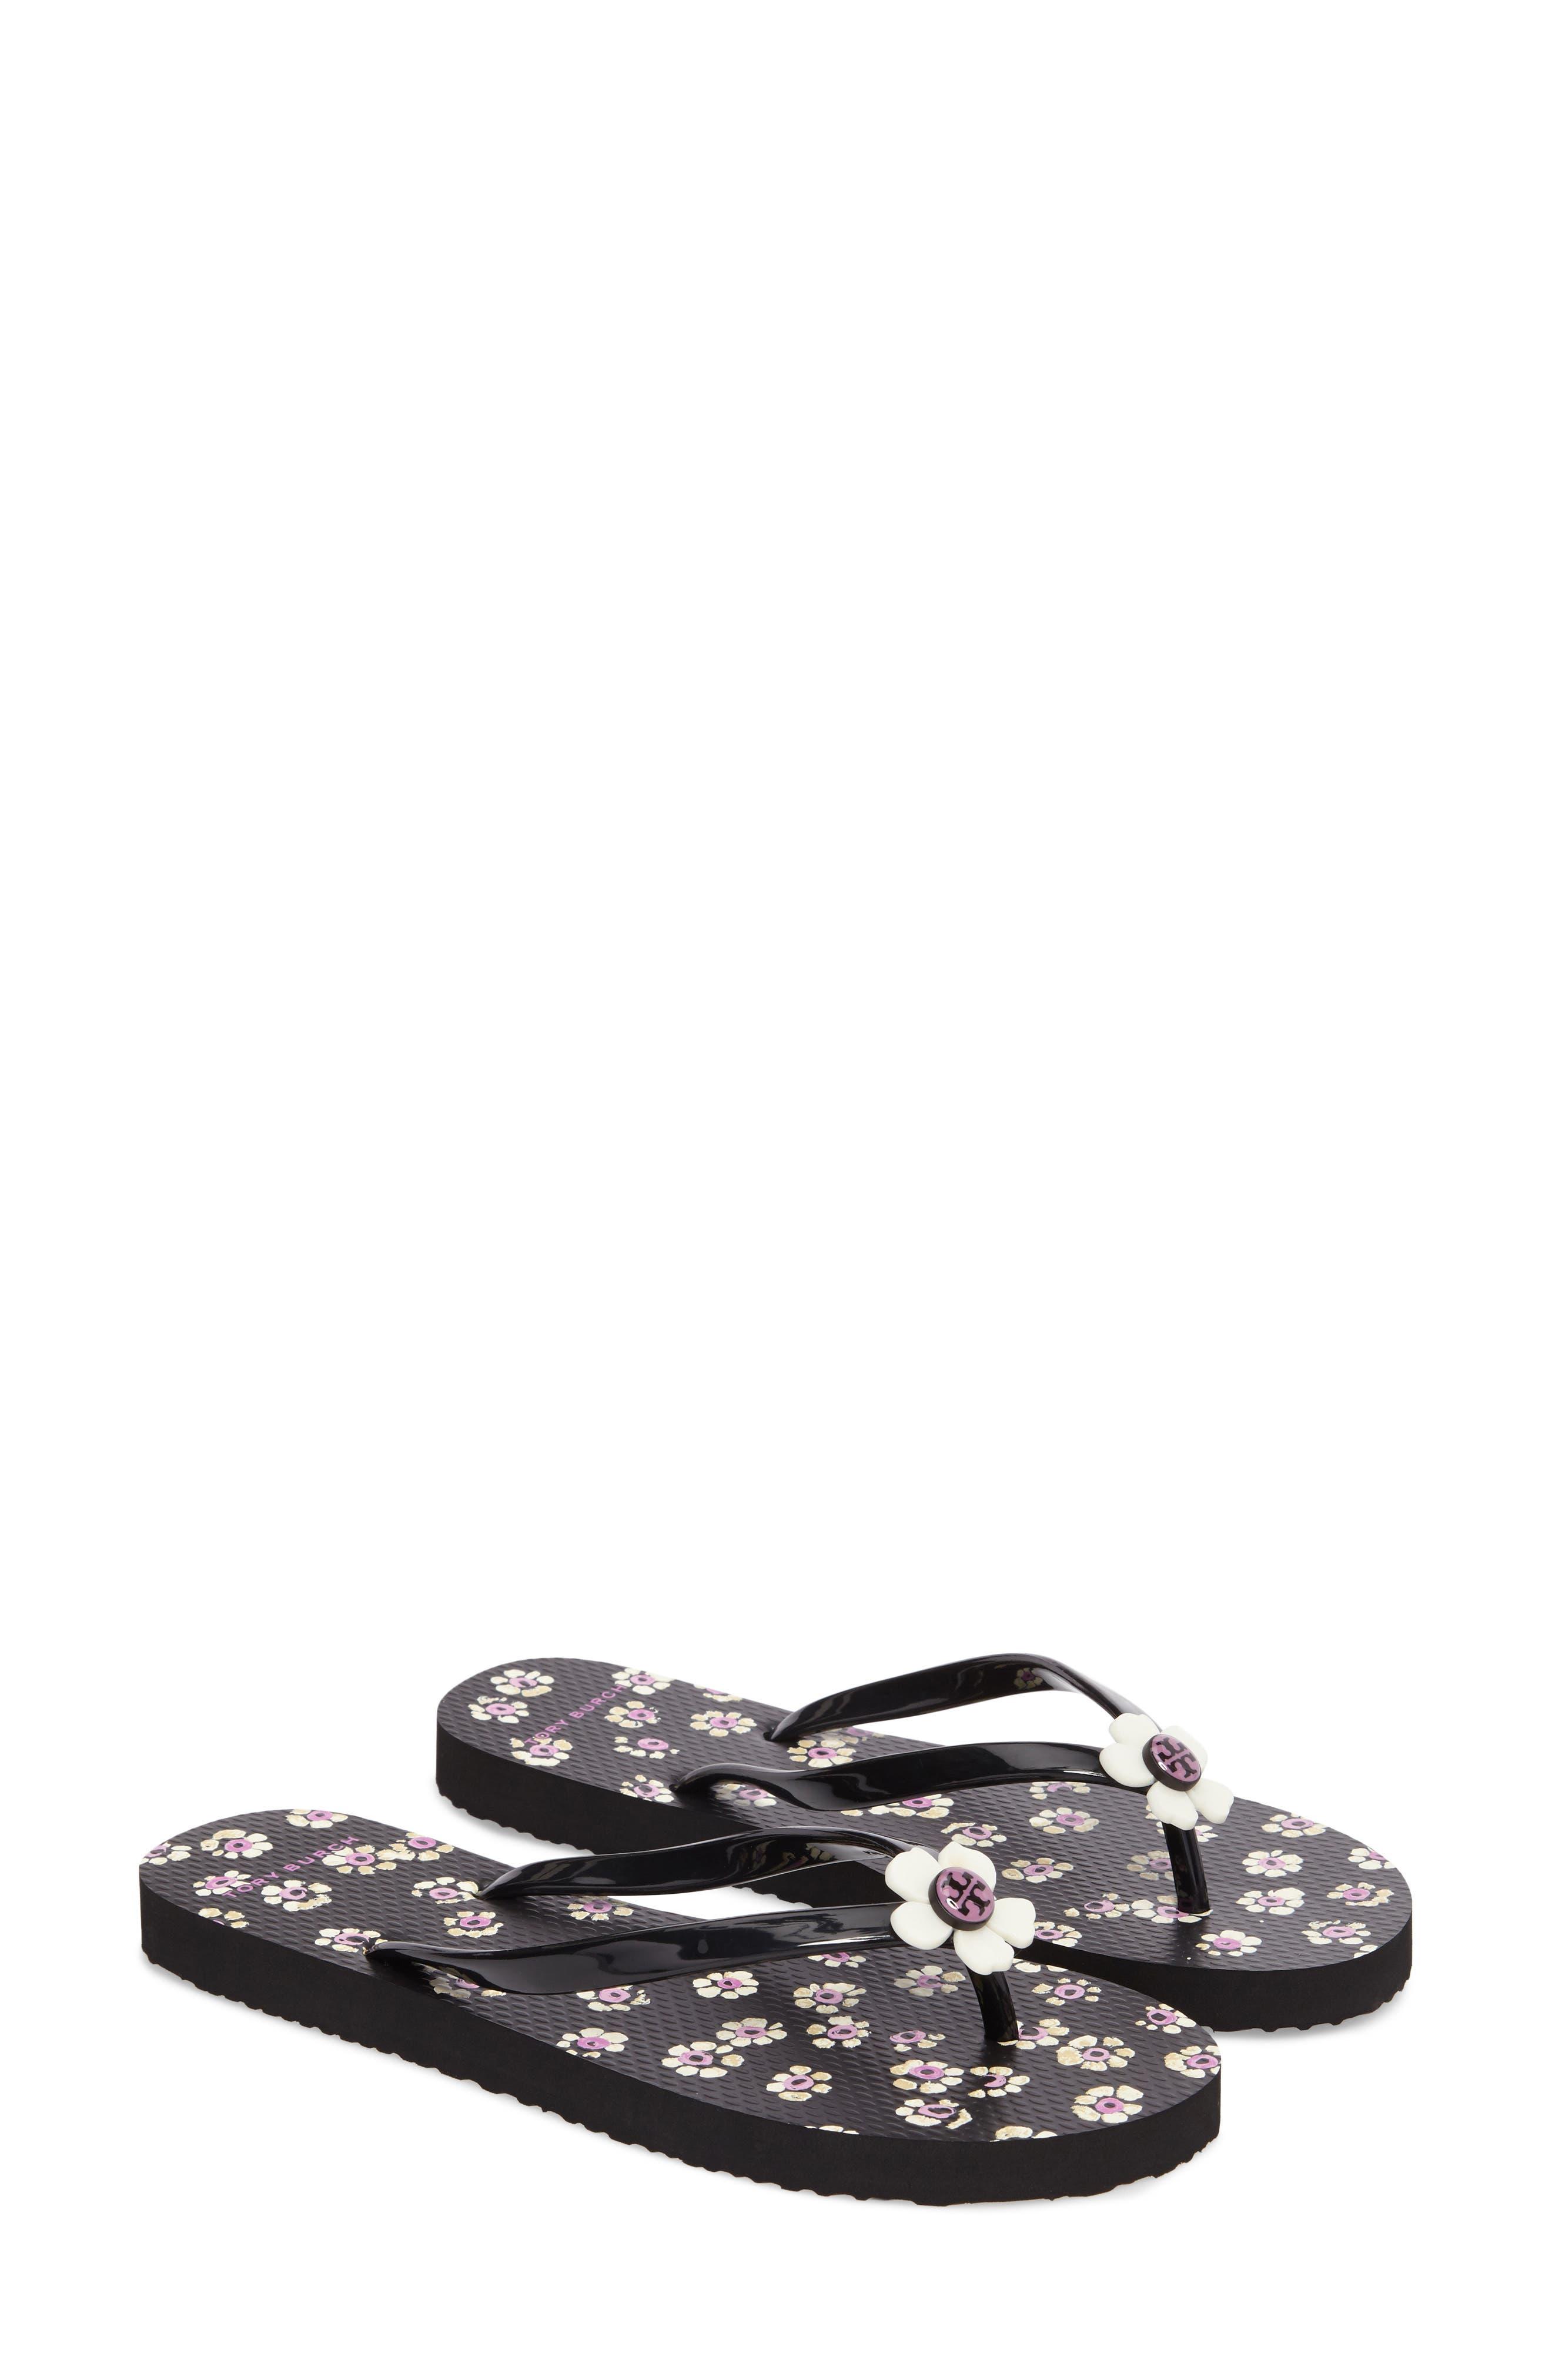 Tory Burch Flower Flip-Flop (Women)